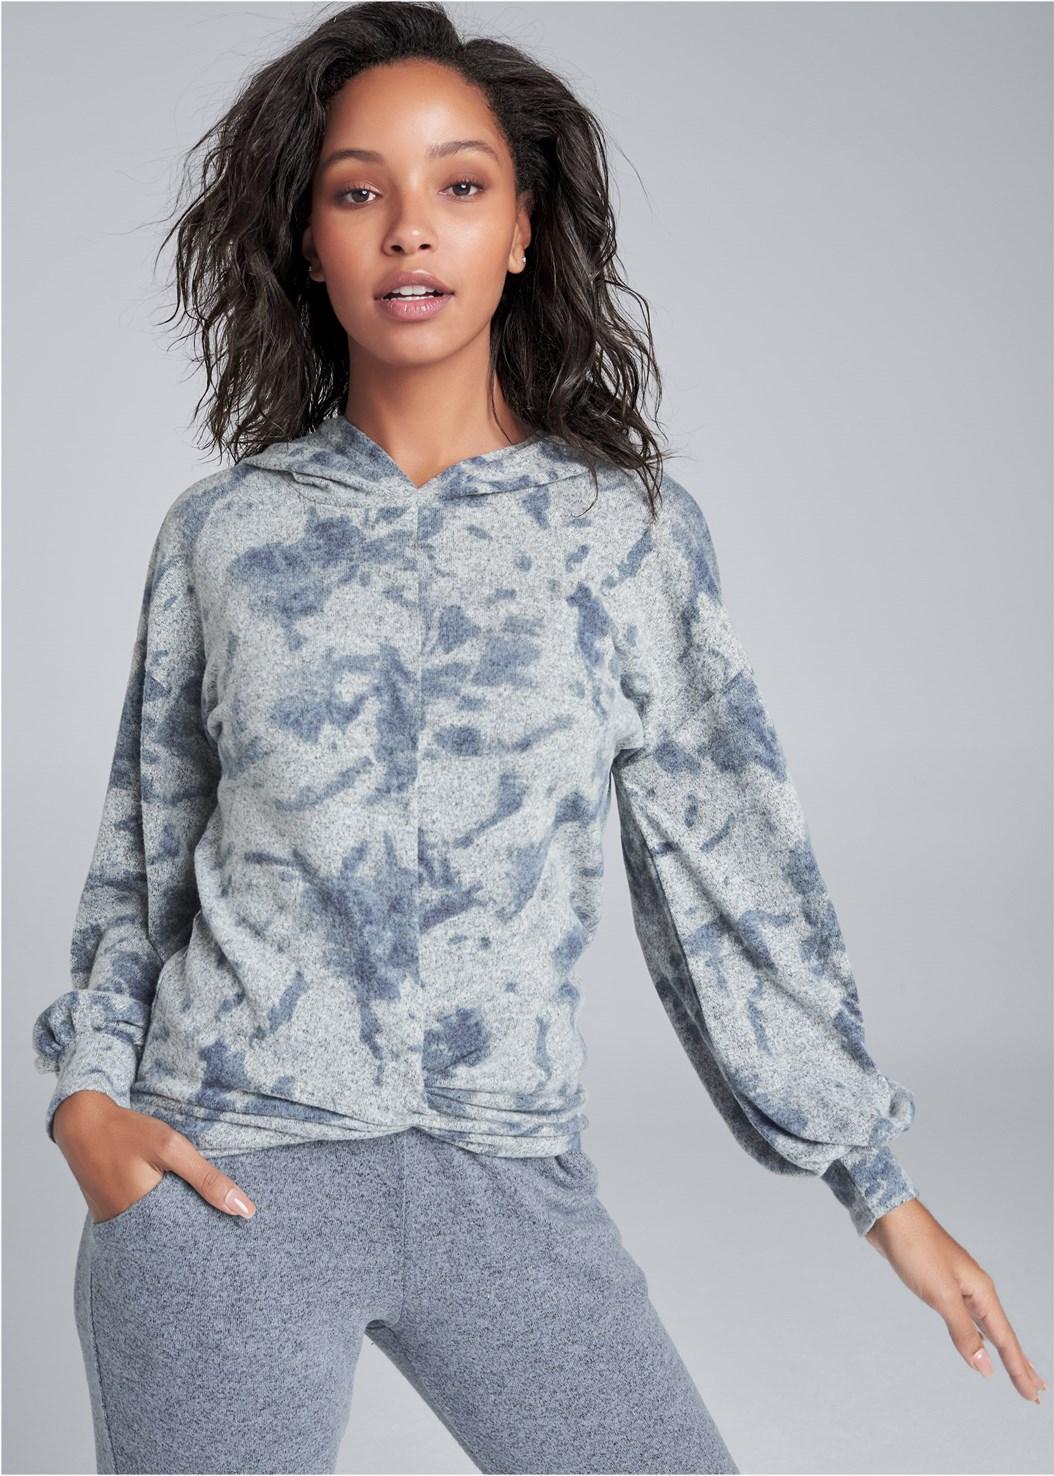 Cozy Knot Detail Hacci Sweatshirt,Cozy Lounge Hacci Joggers